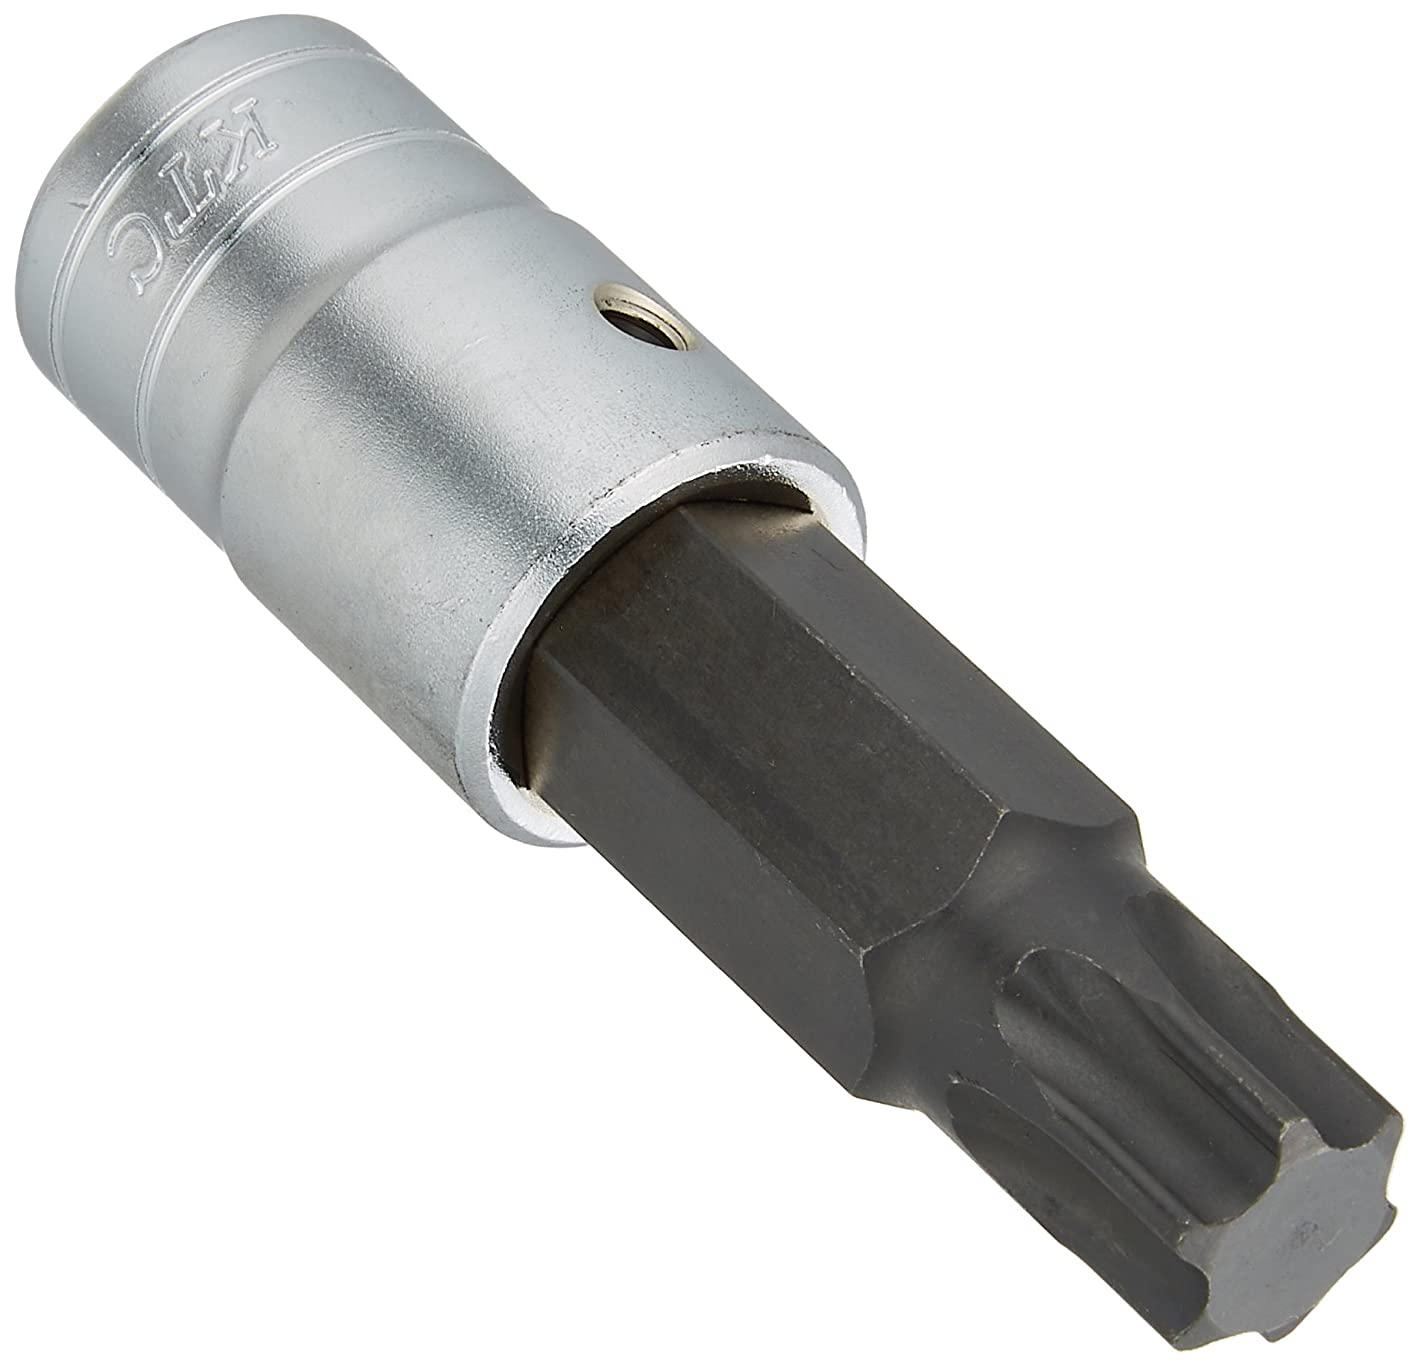 KTC(ケーテーシー) 12.7mm (1/2インチ) T型 トルクス ビットソケット T70 BT4T70